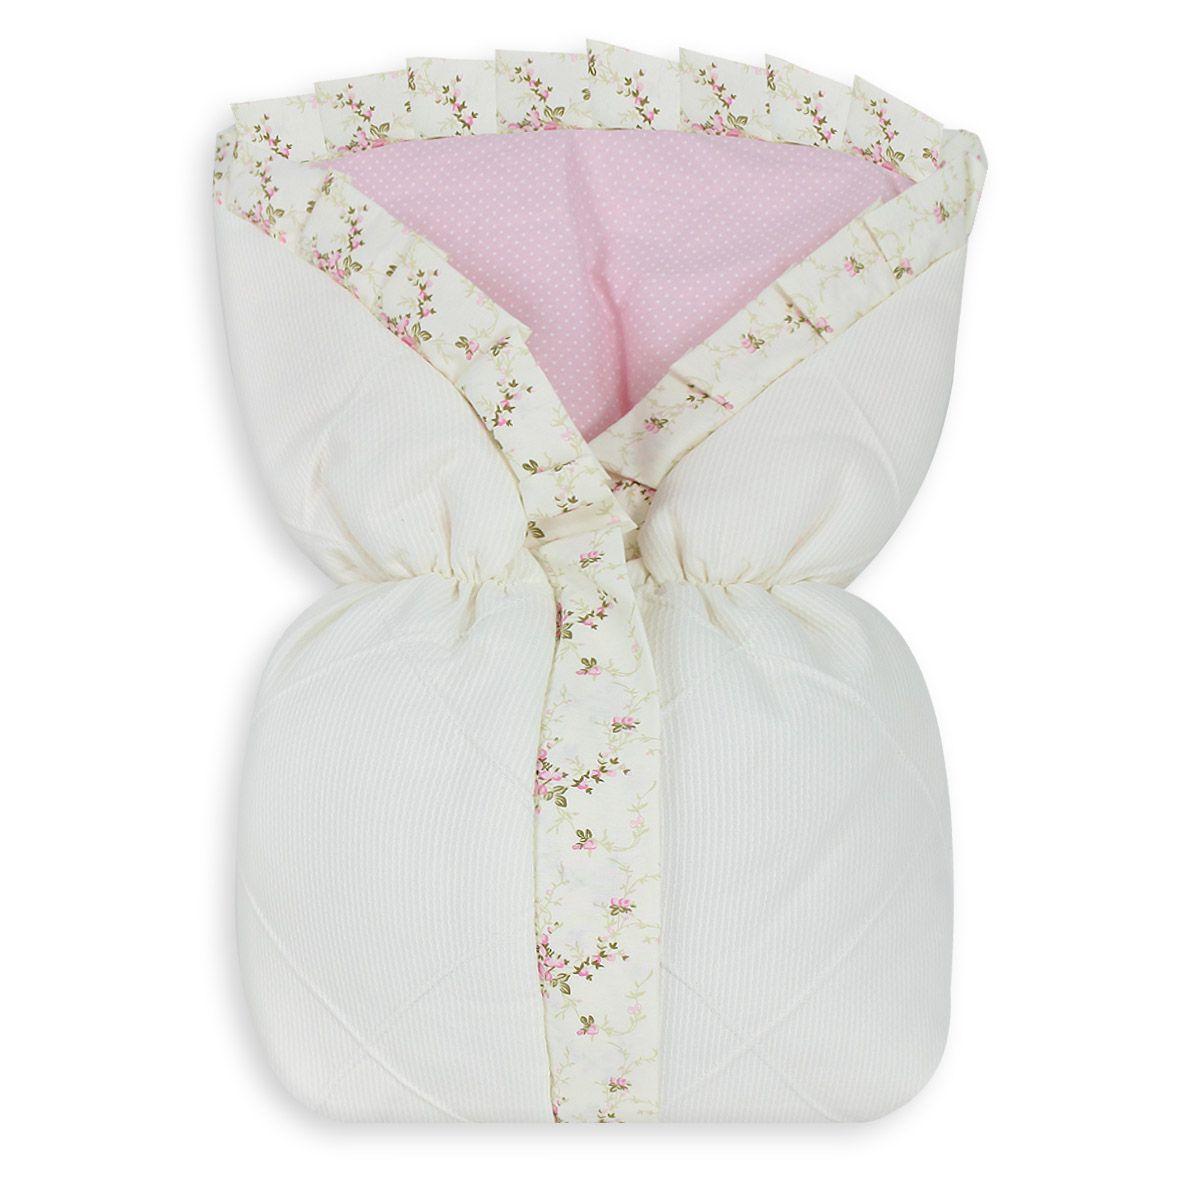 Saco de Bebê 100% Alg. - Nervura Floral Rosa